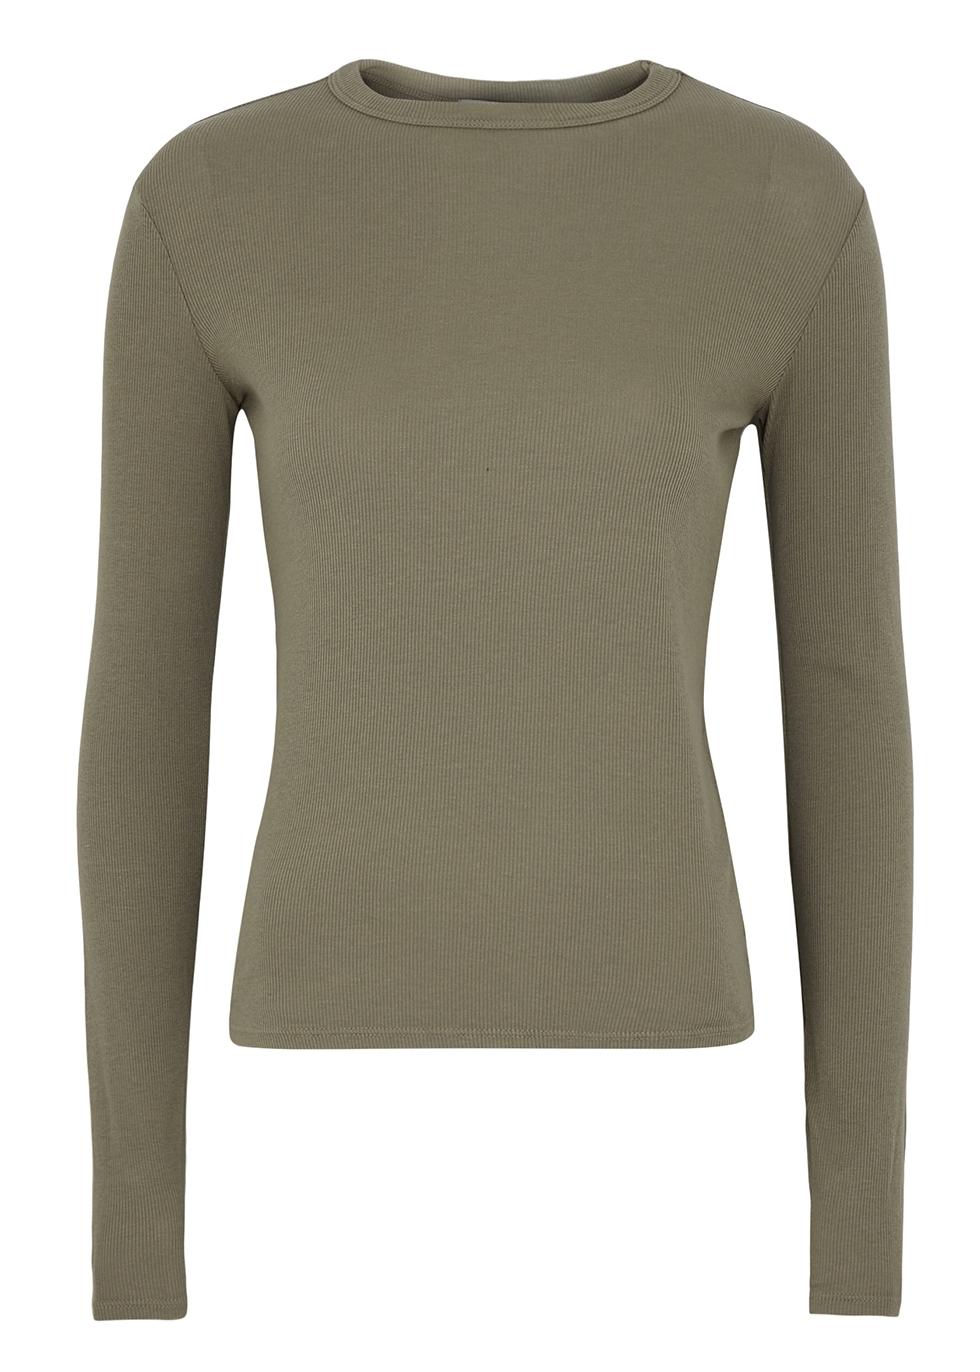 Verona green ribbed jersey top